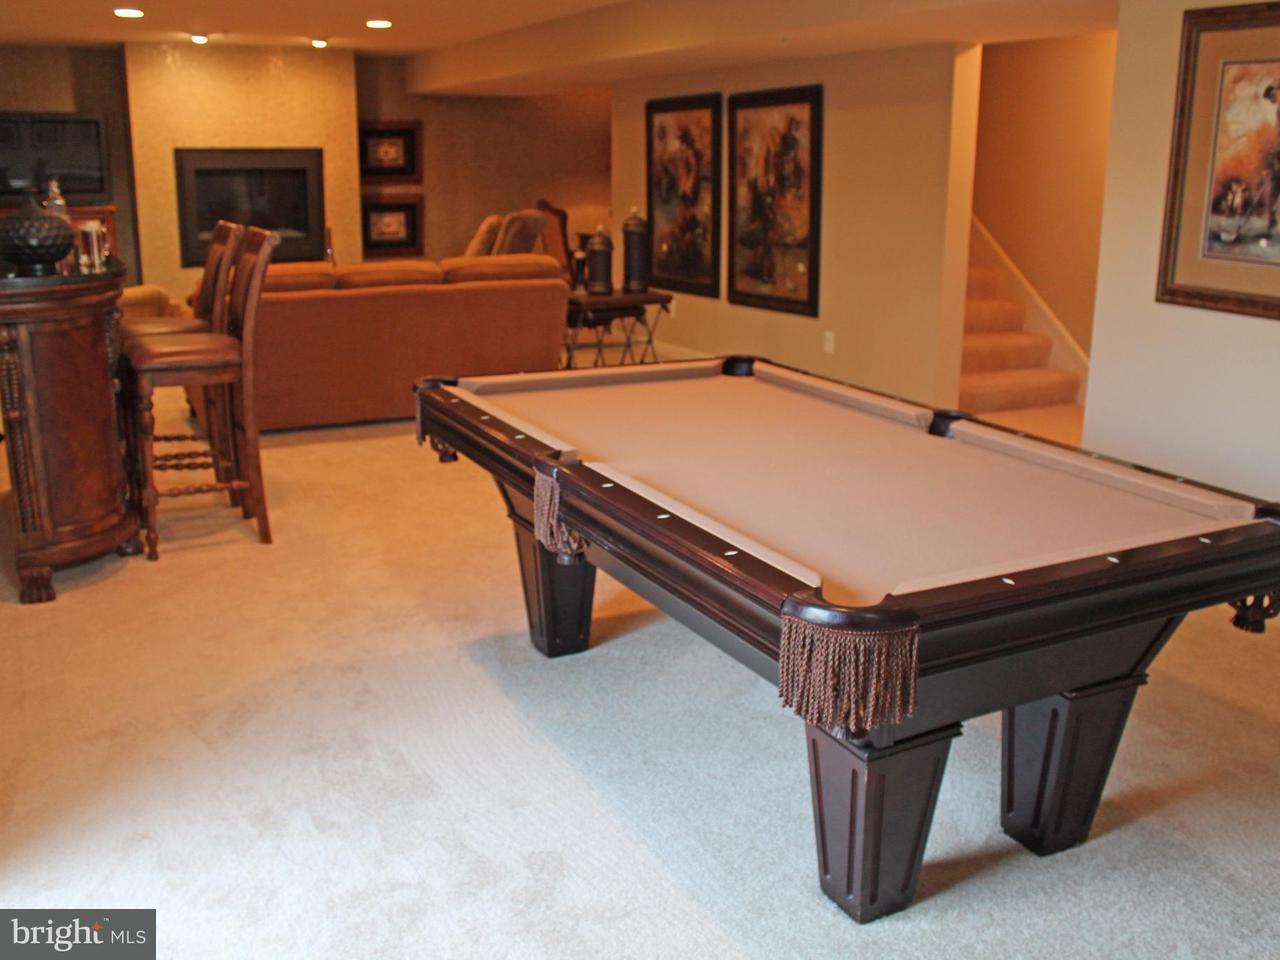 独户住宅 为 销售 在 1007 STANSBURY Road 1007 STANSBURY Road Pylesville, 马里兰州 21132 美国